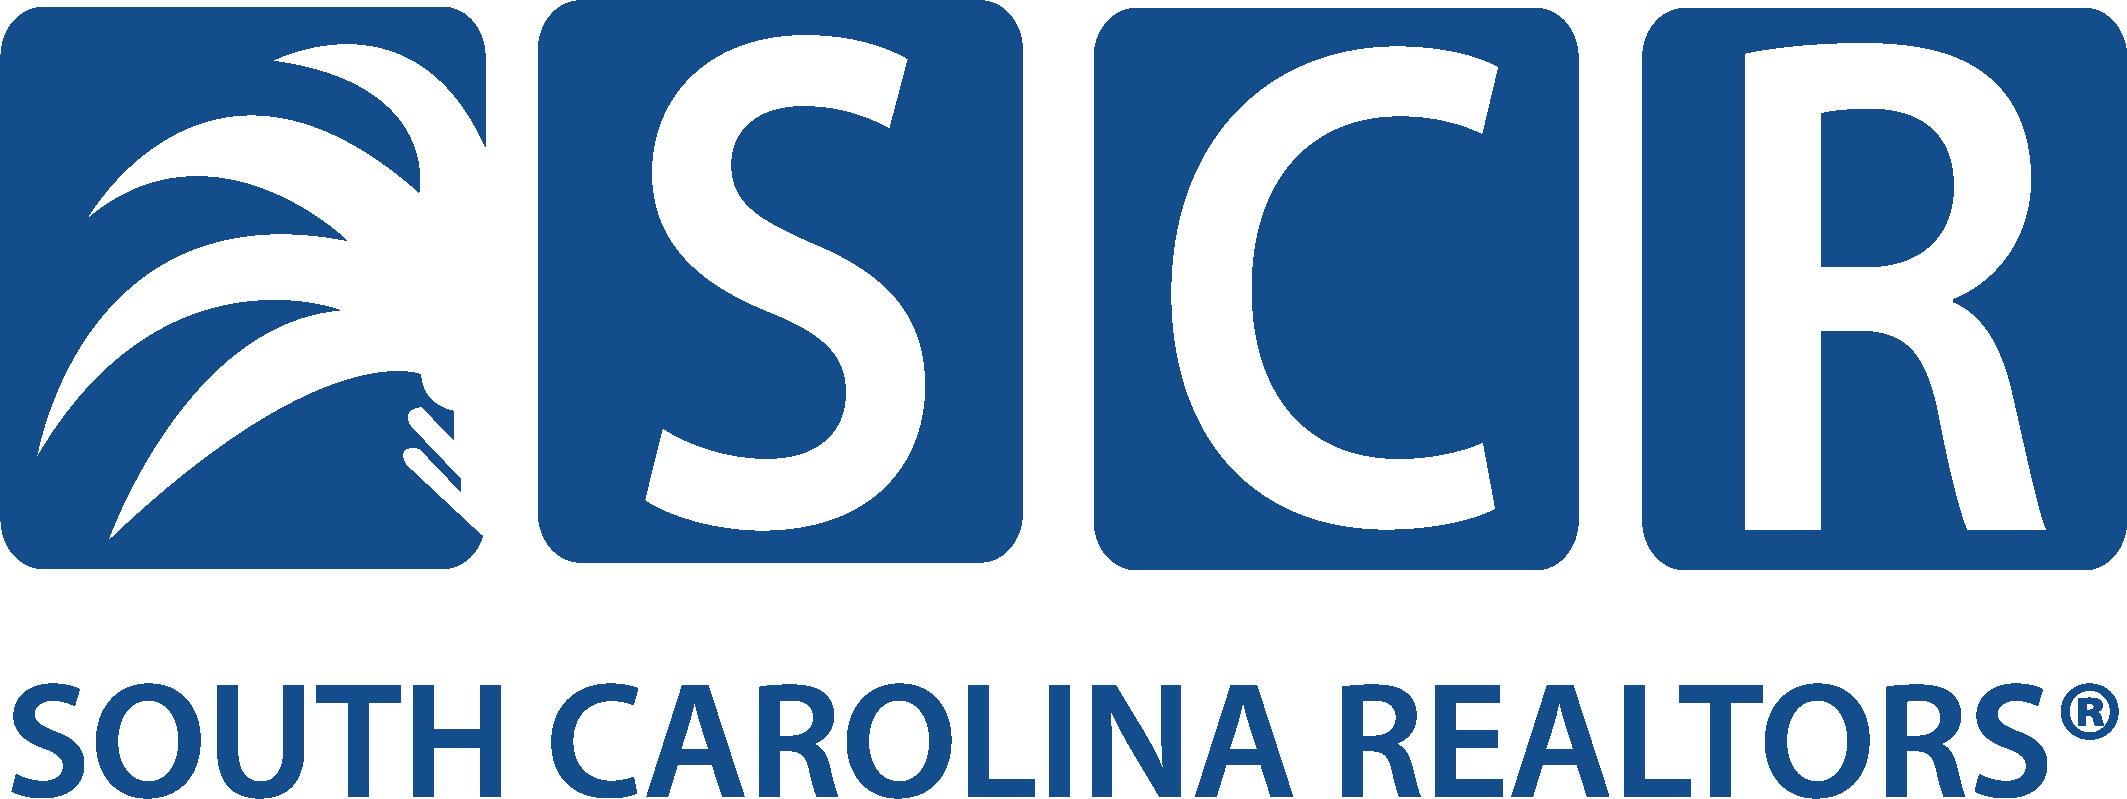 SC Realtors logo